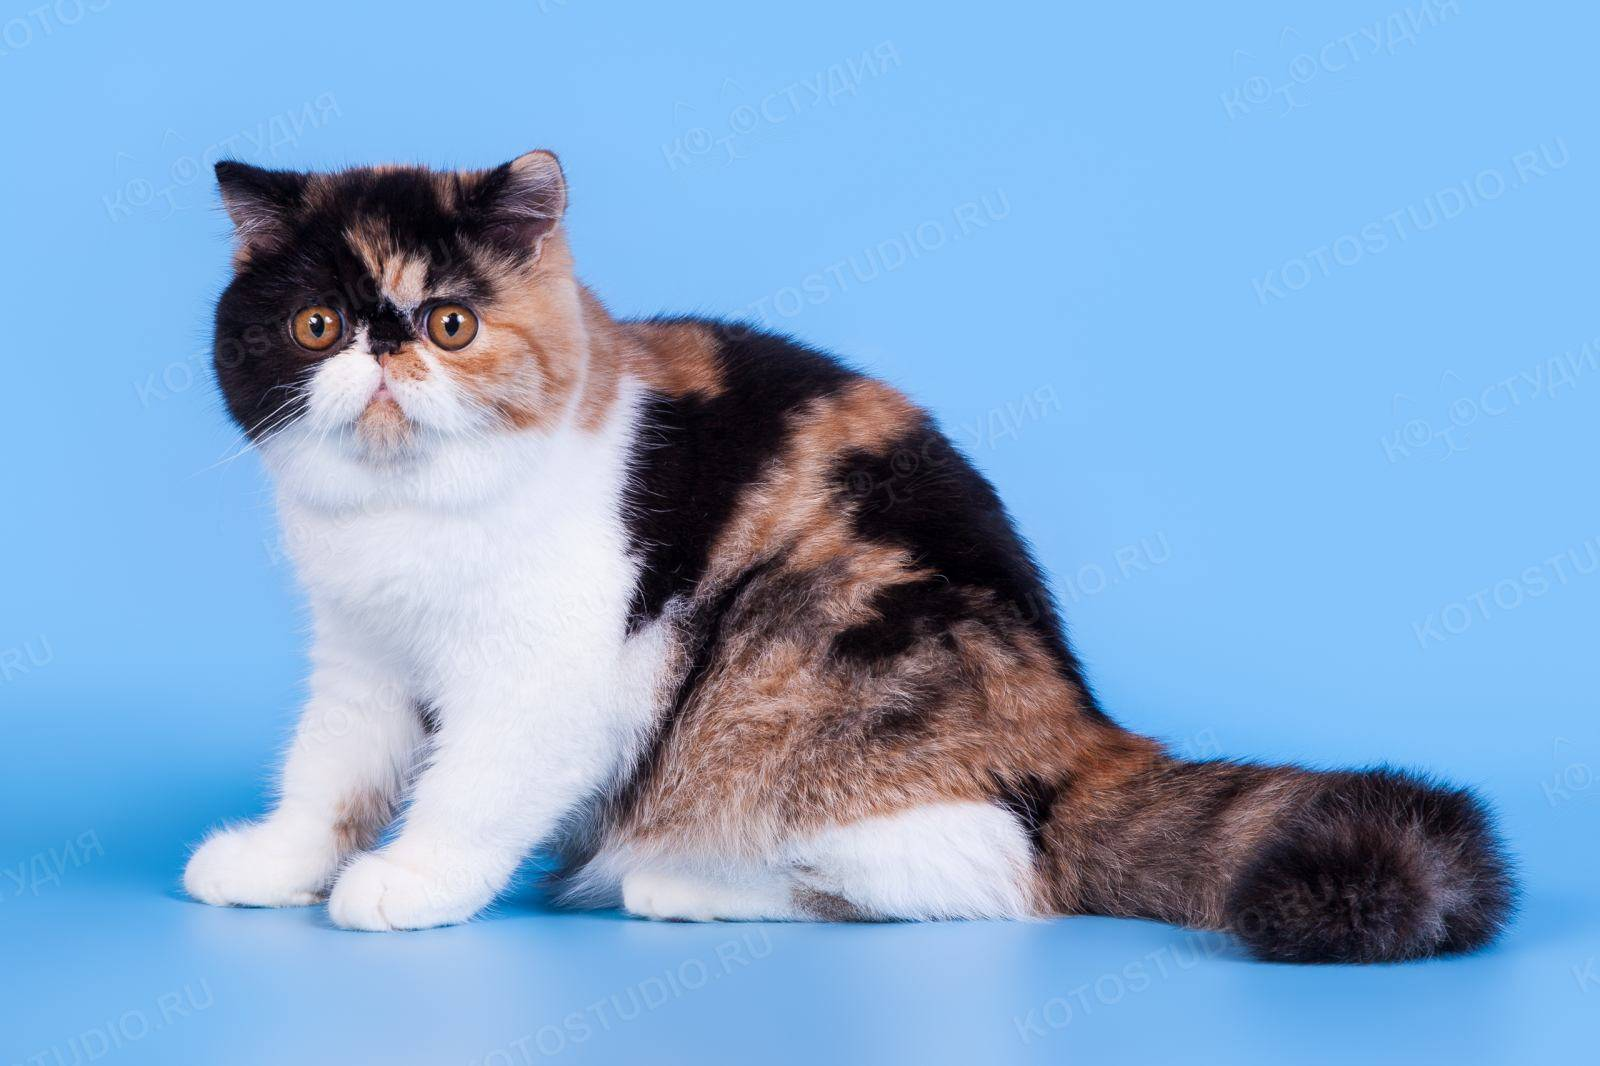 Экзот кот: фото, внешний вид, характер, содержание и уход